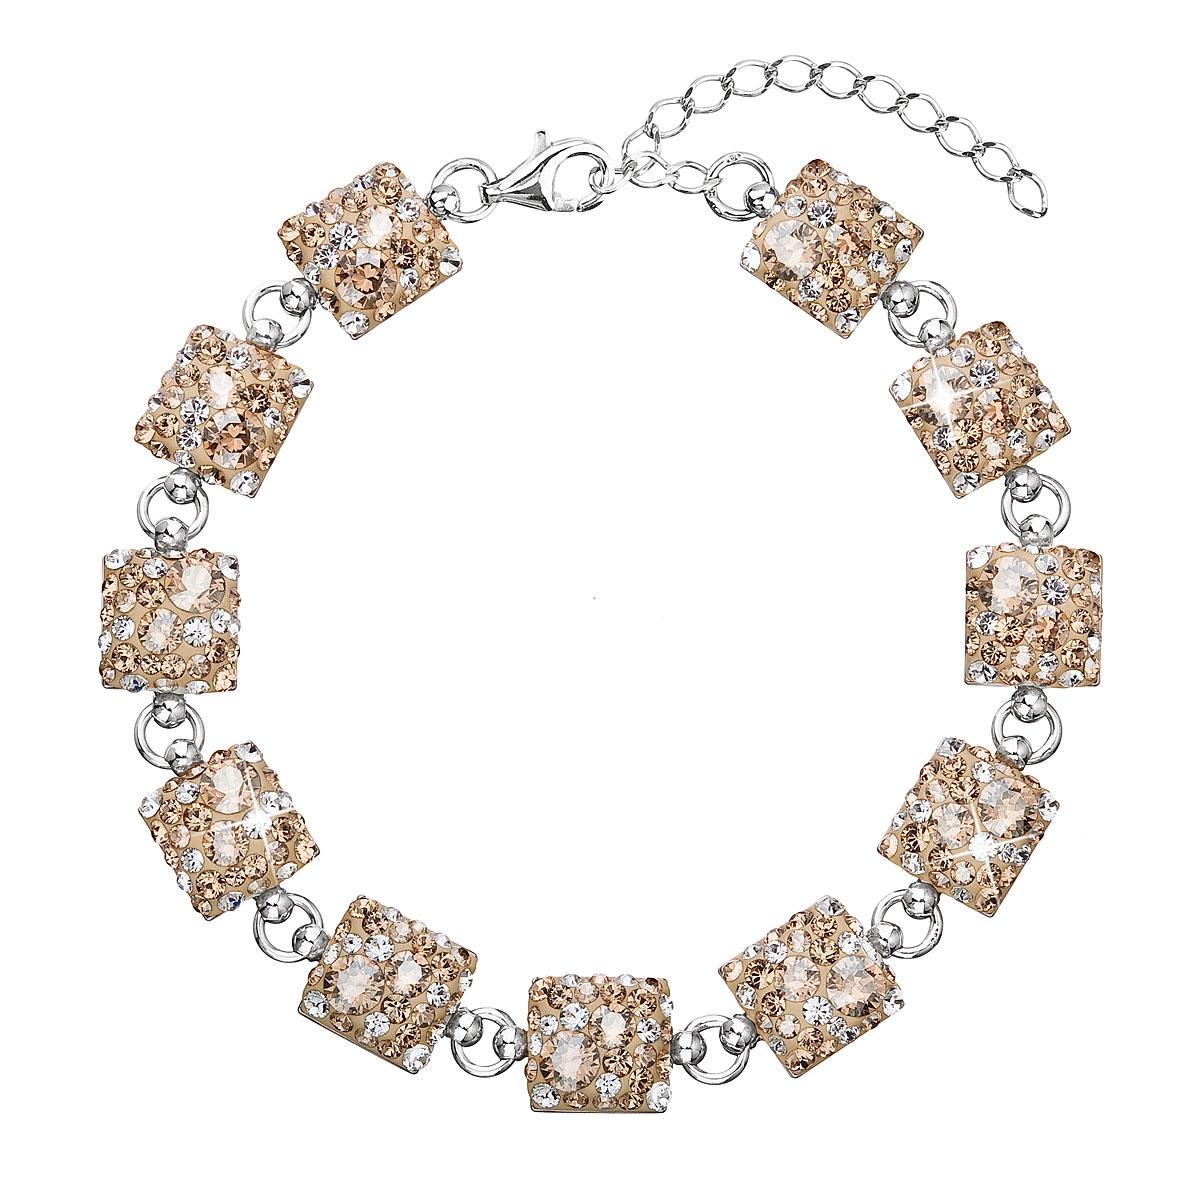 Stříbrný náramek s krystaly Crystals from Swarovski® Gold mix EG7002-GDX